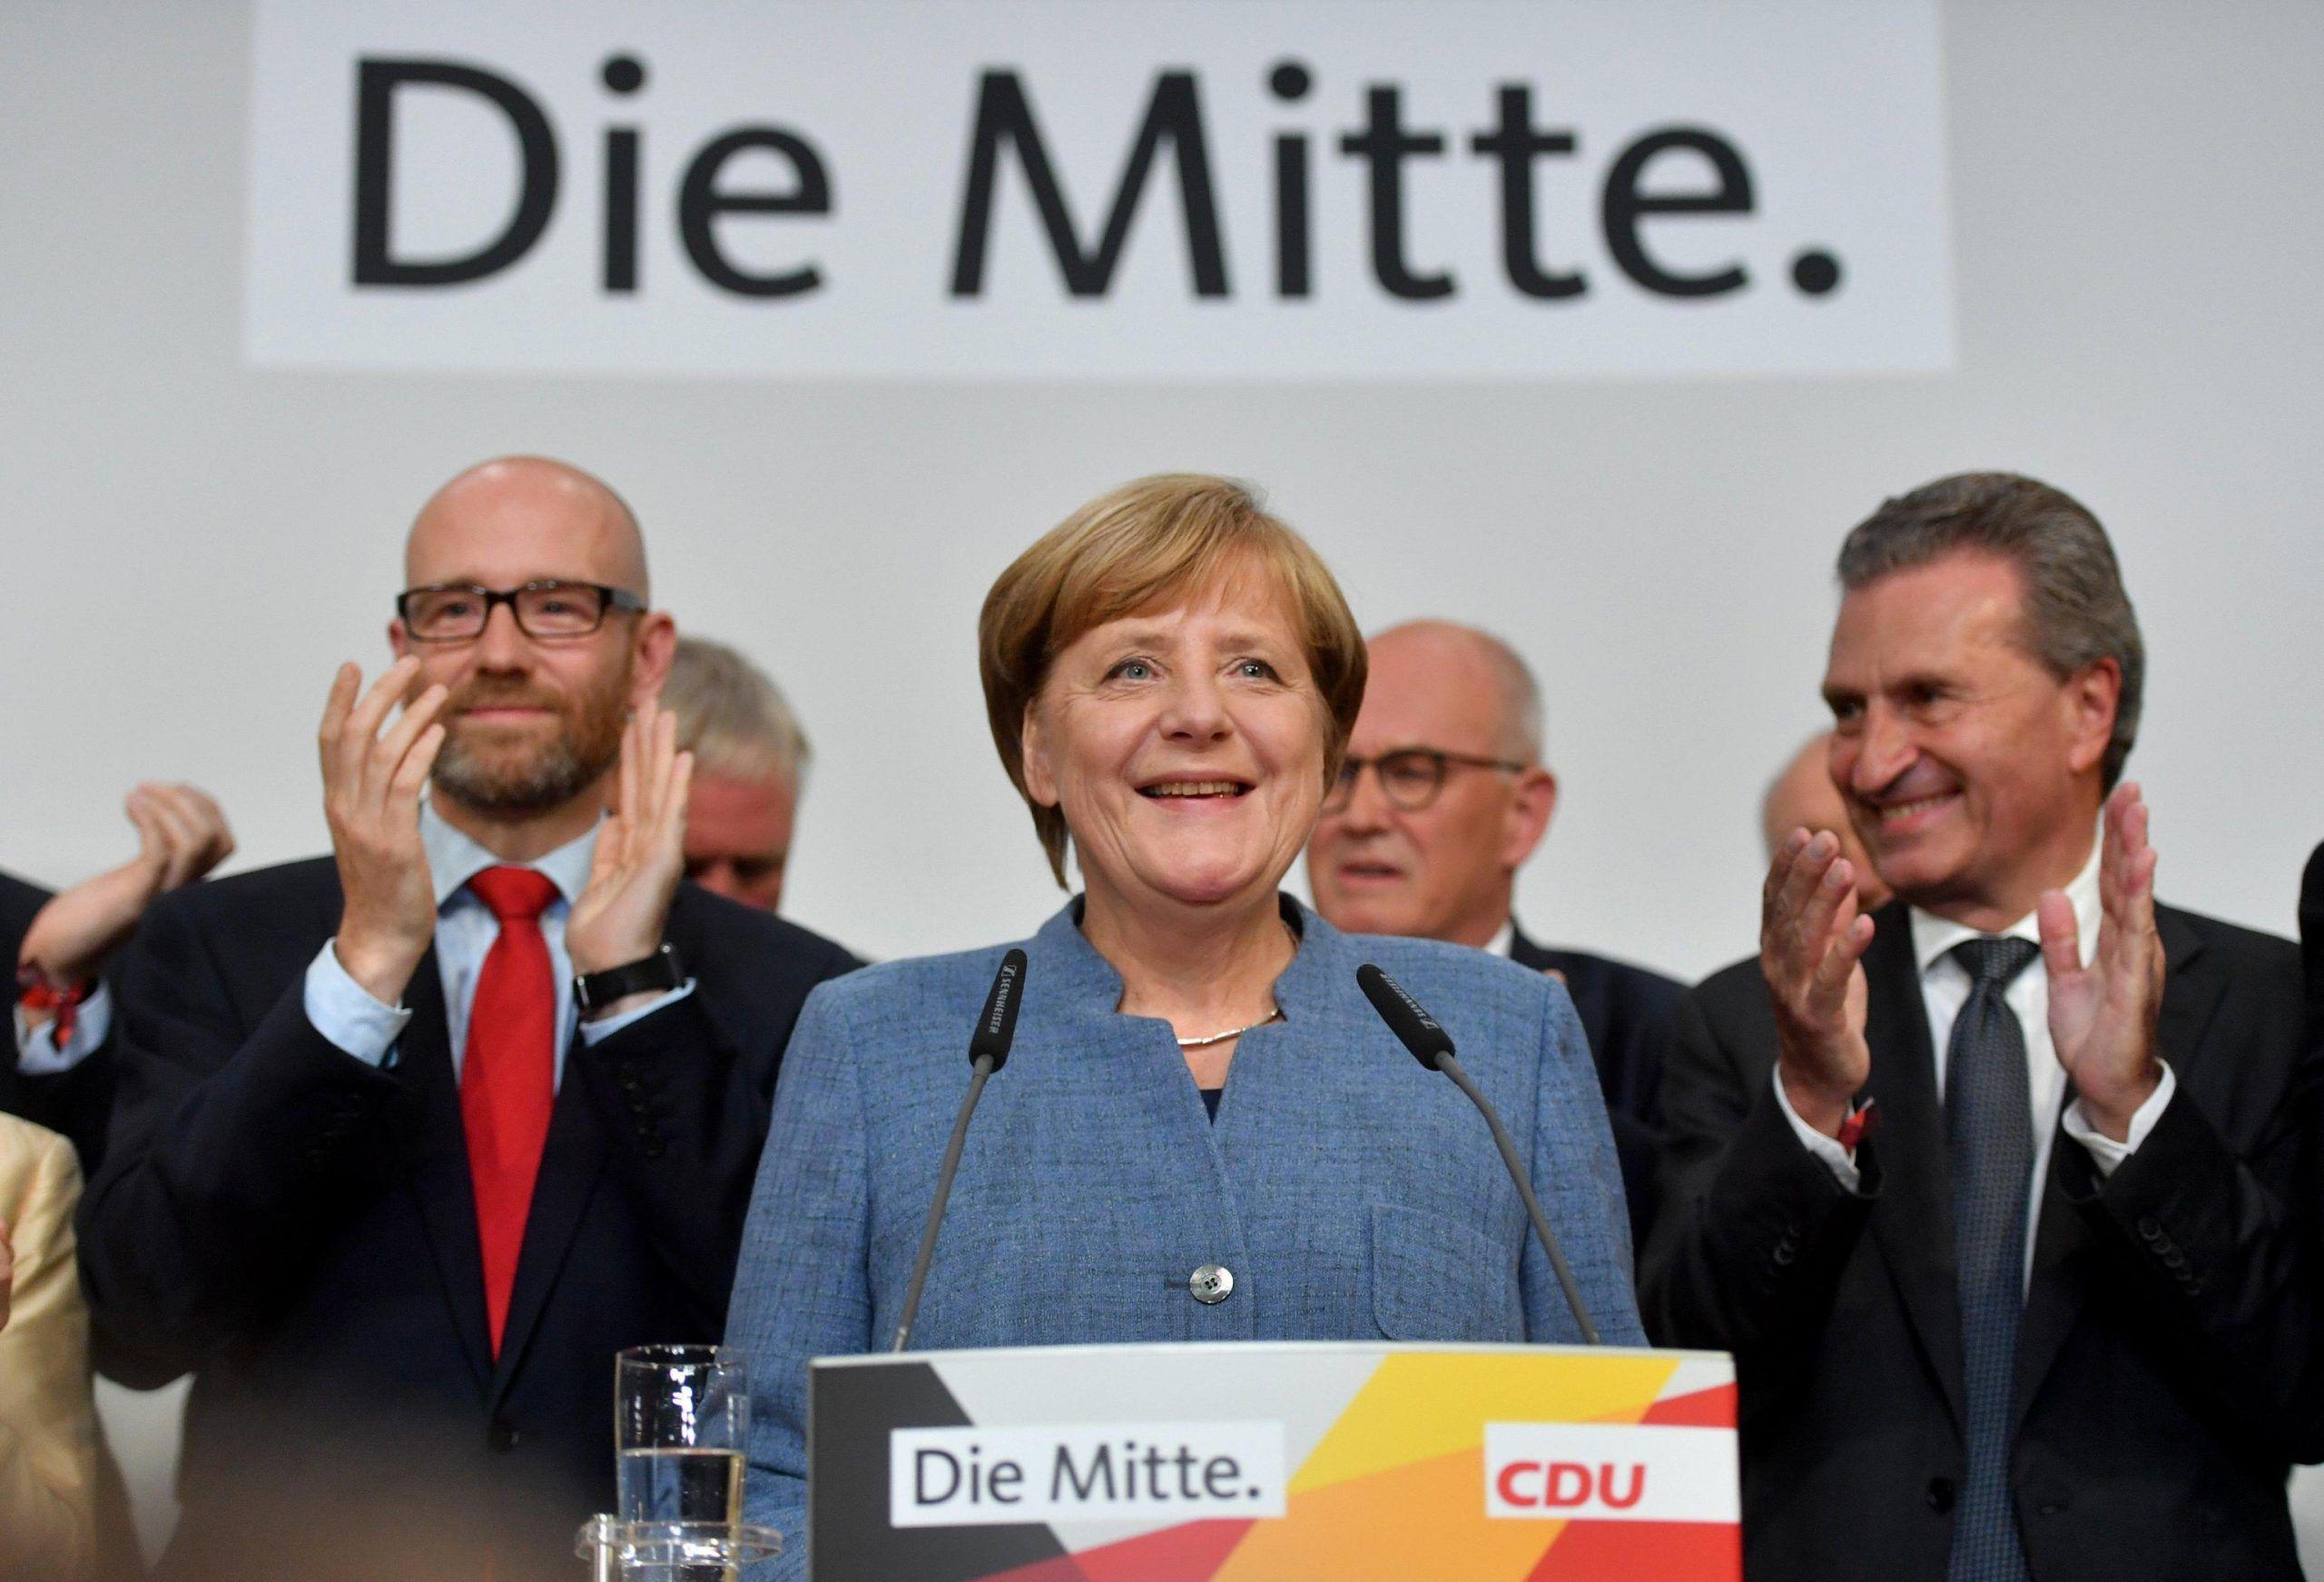 >>>/ IN GERMANIA LA MERKEL VINCE MA ARRETRA, VOLANO I POPULISTI